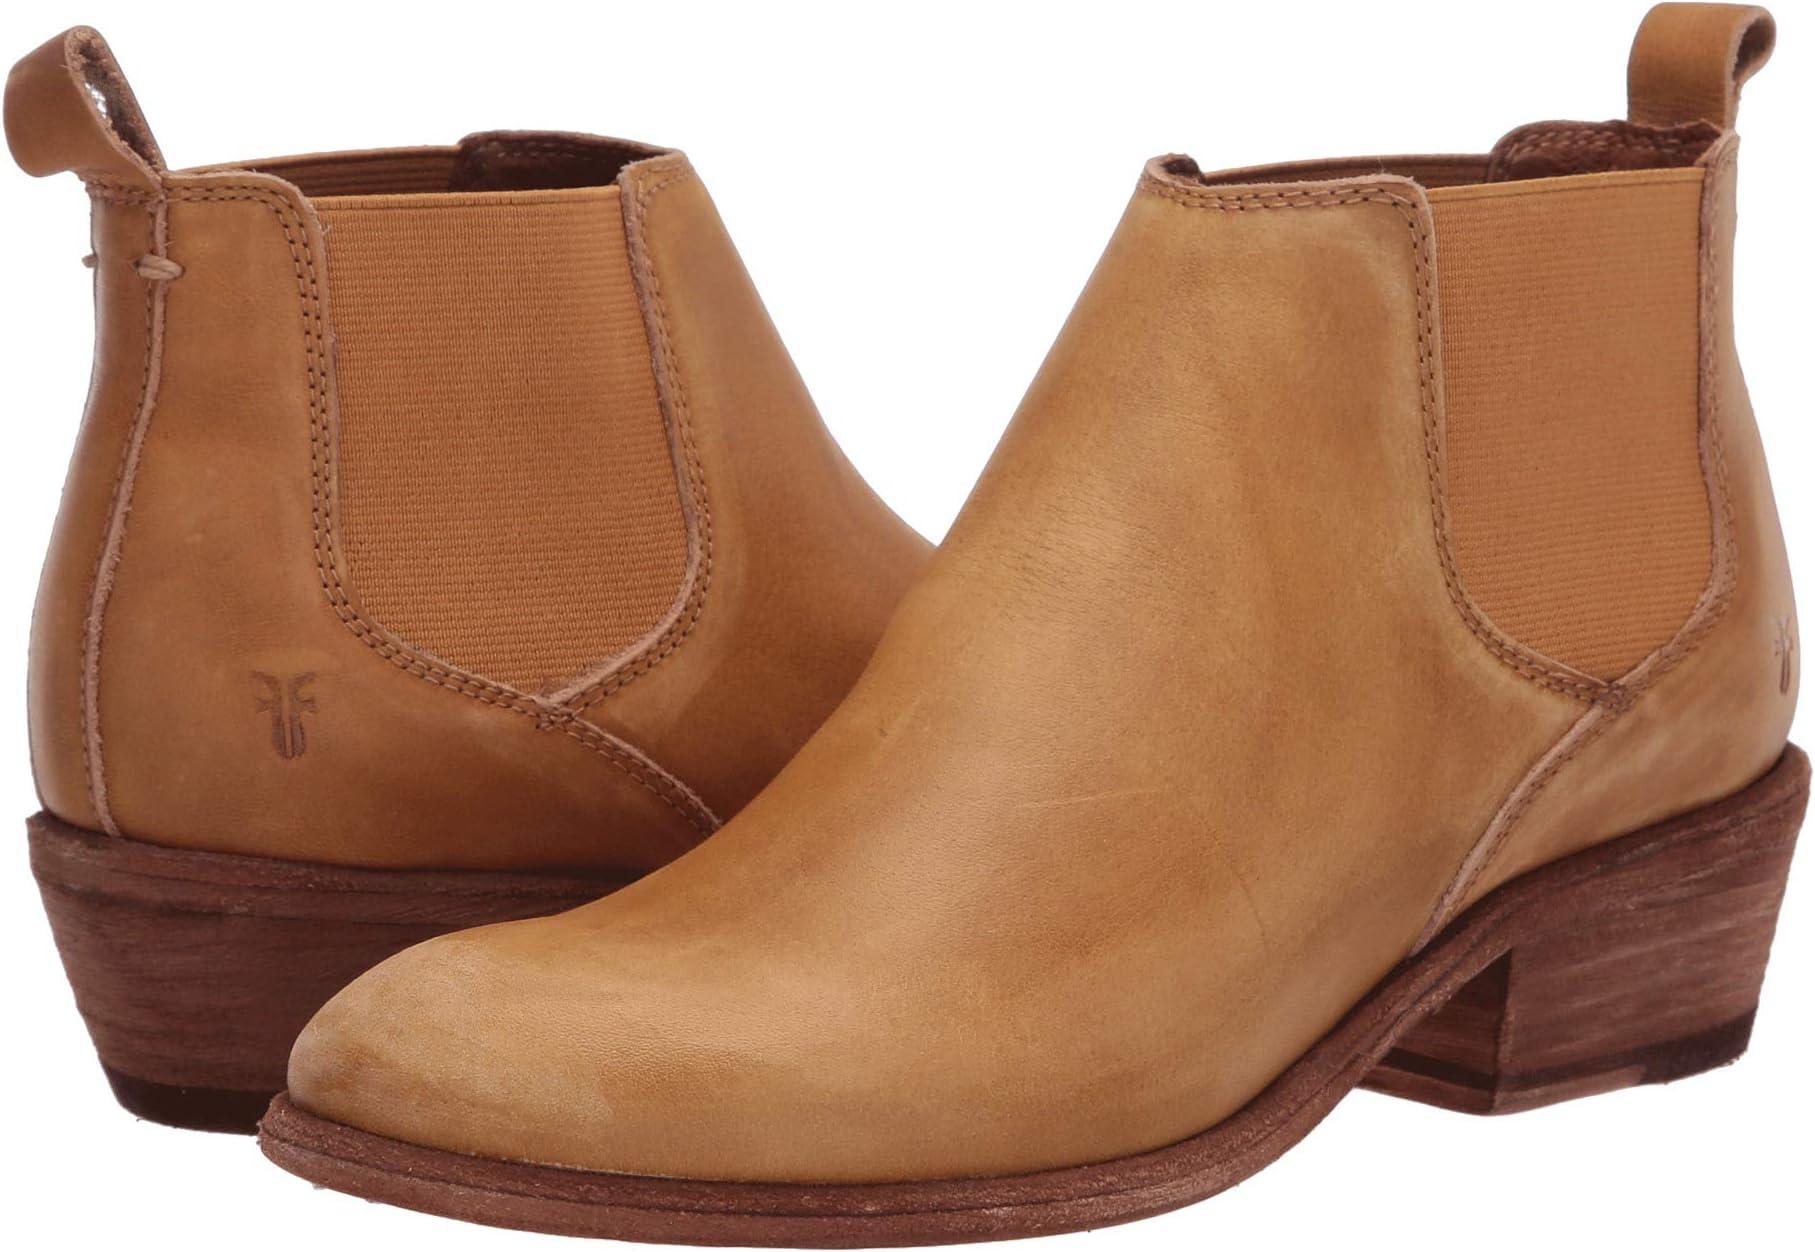 Frye Boots & Booties